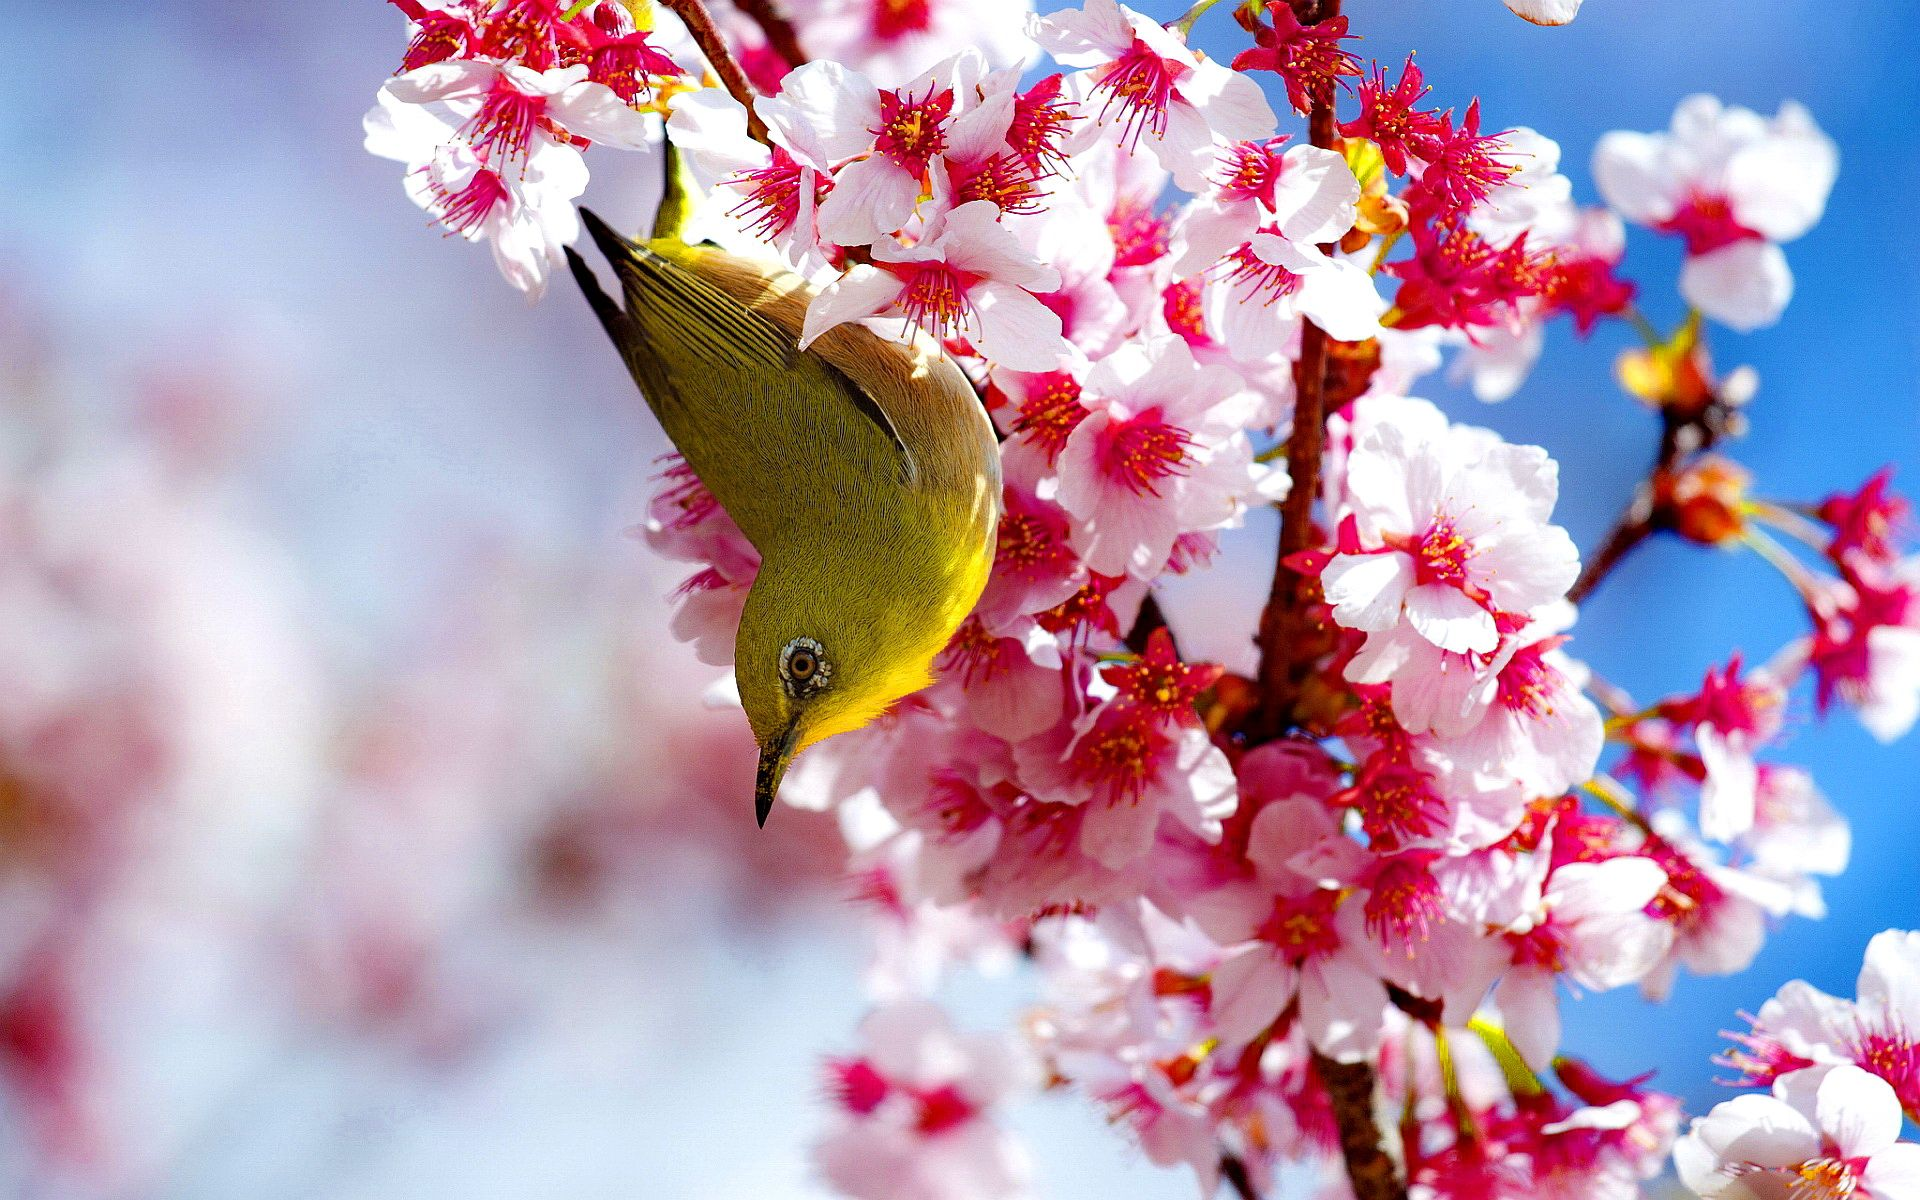 Bird In Cherry Blossoms Cherry Blossom Wallpaper Cherry Blossom Pictures Cherry Blossom Images